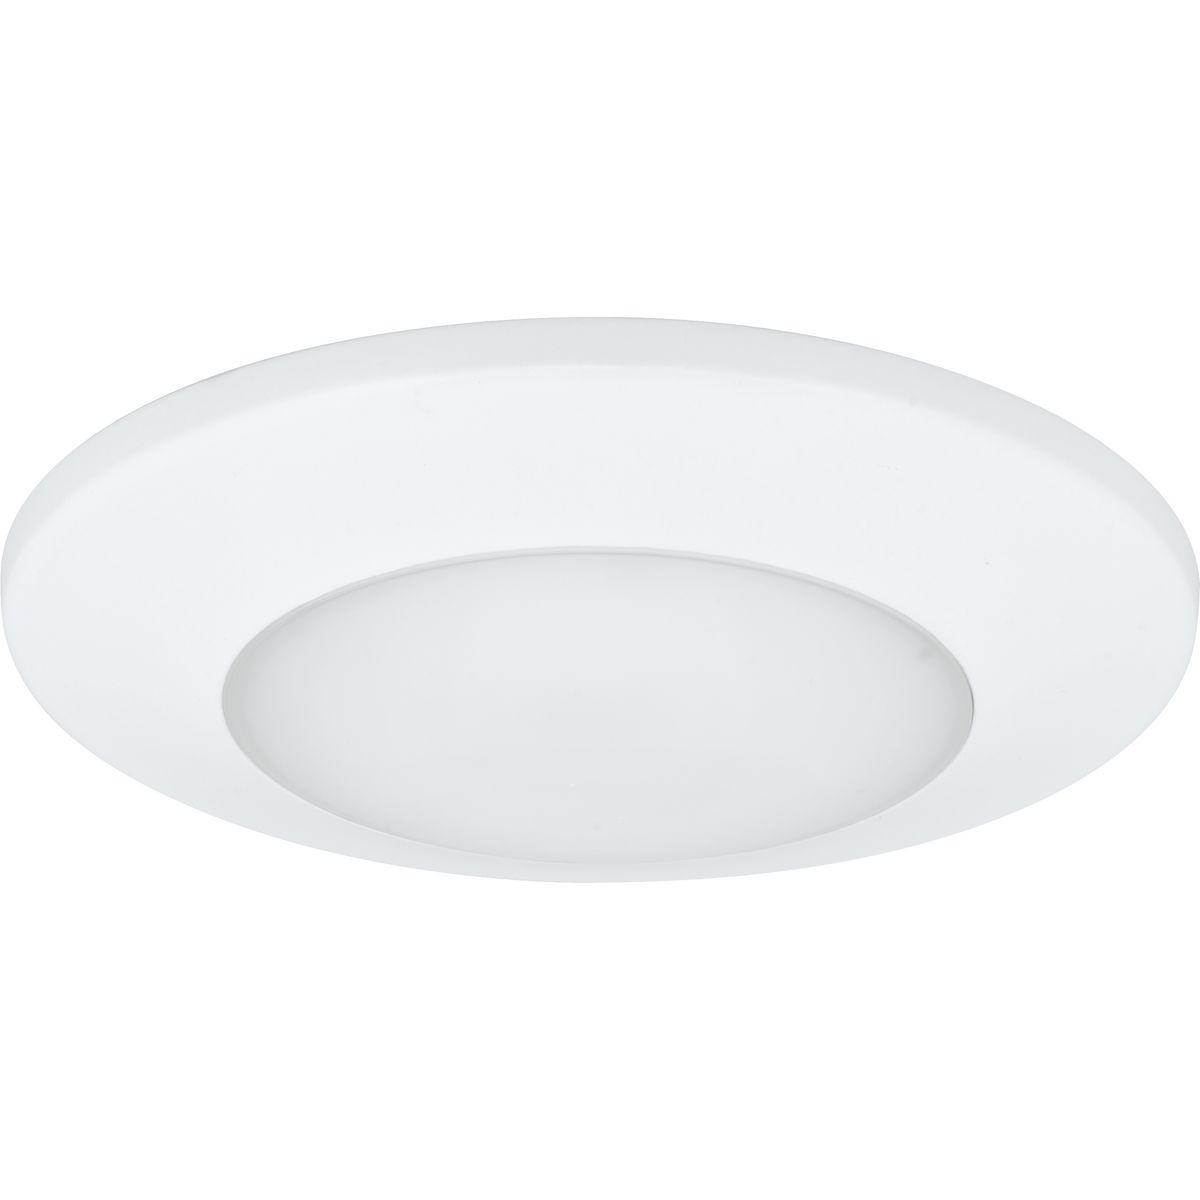 P8222-28-30K PROGRESS 7.25IN LED FLUSH MT T24